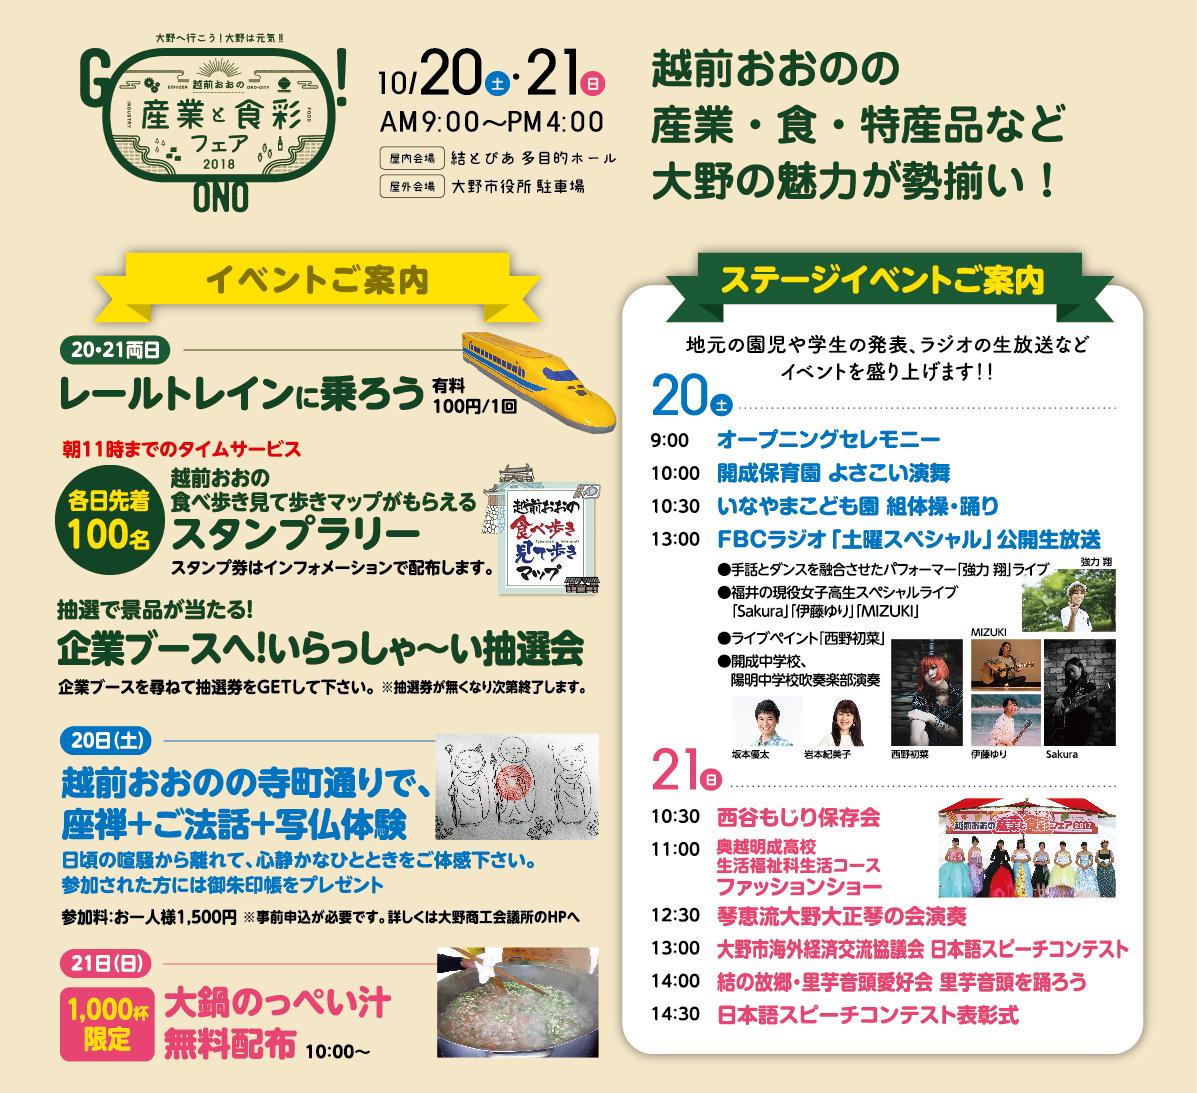 event-stage-info.jpg